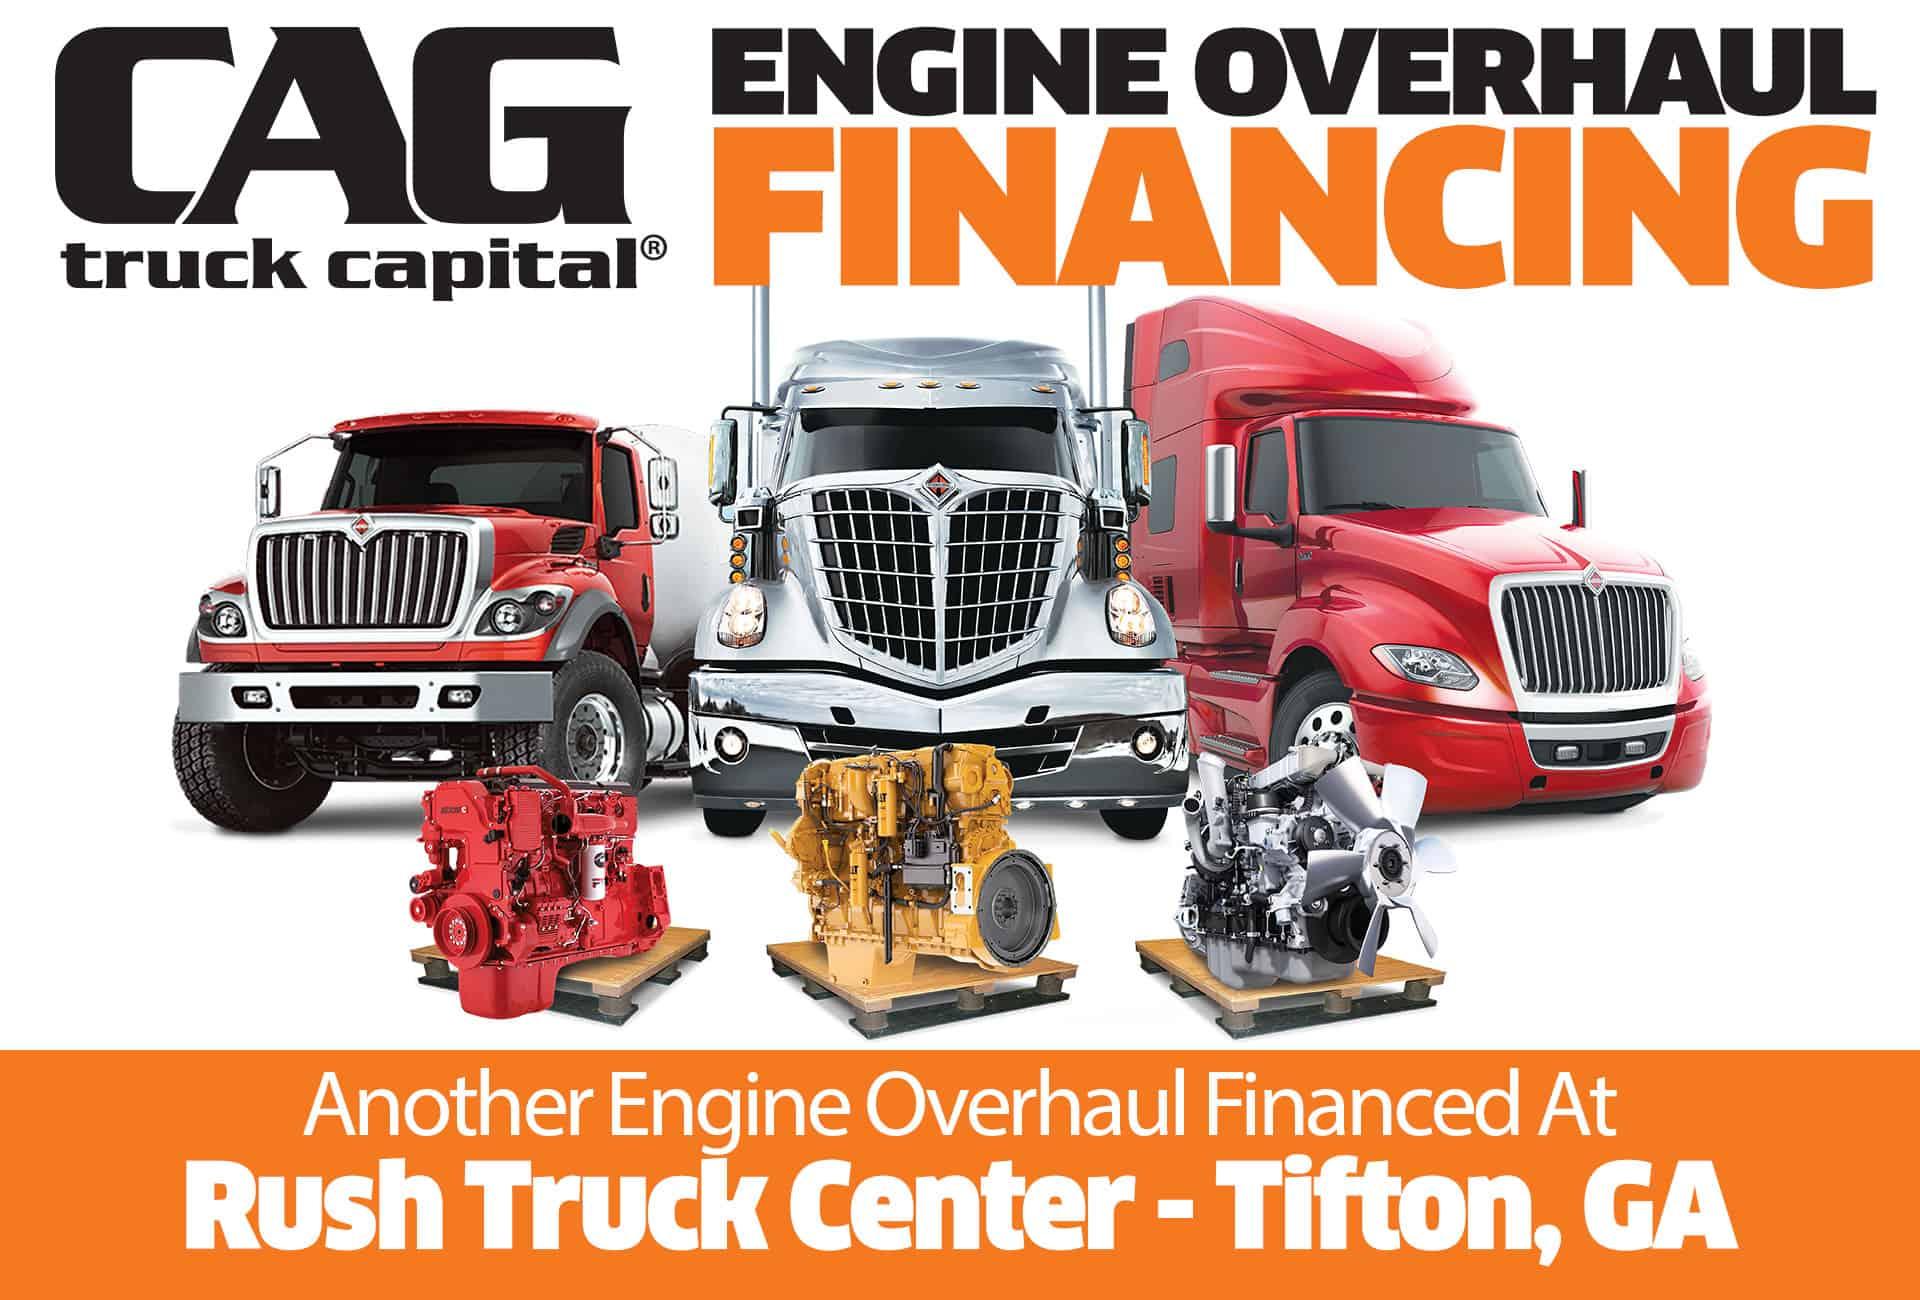 Rush Truck Center Tifton GA